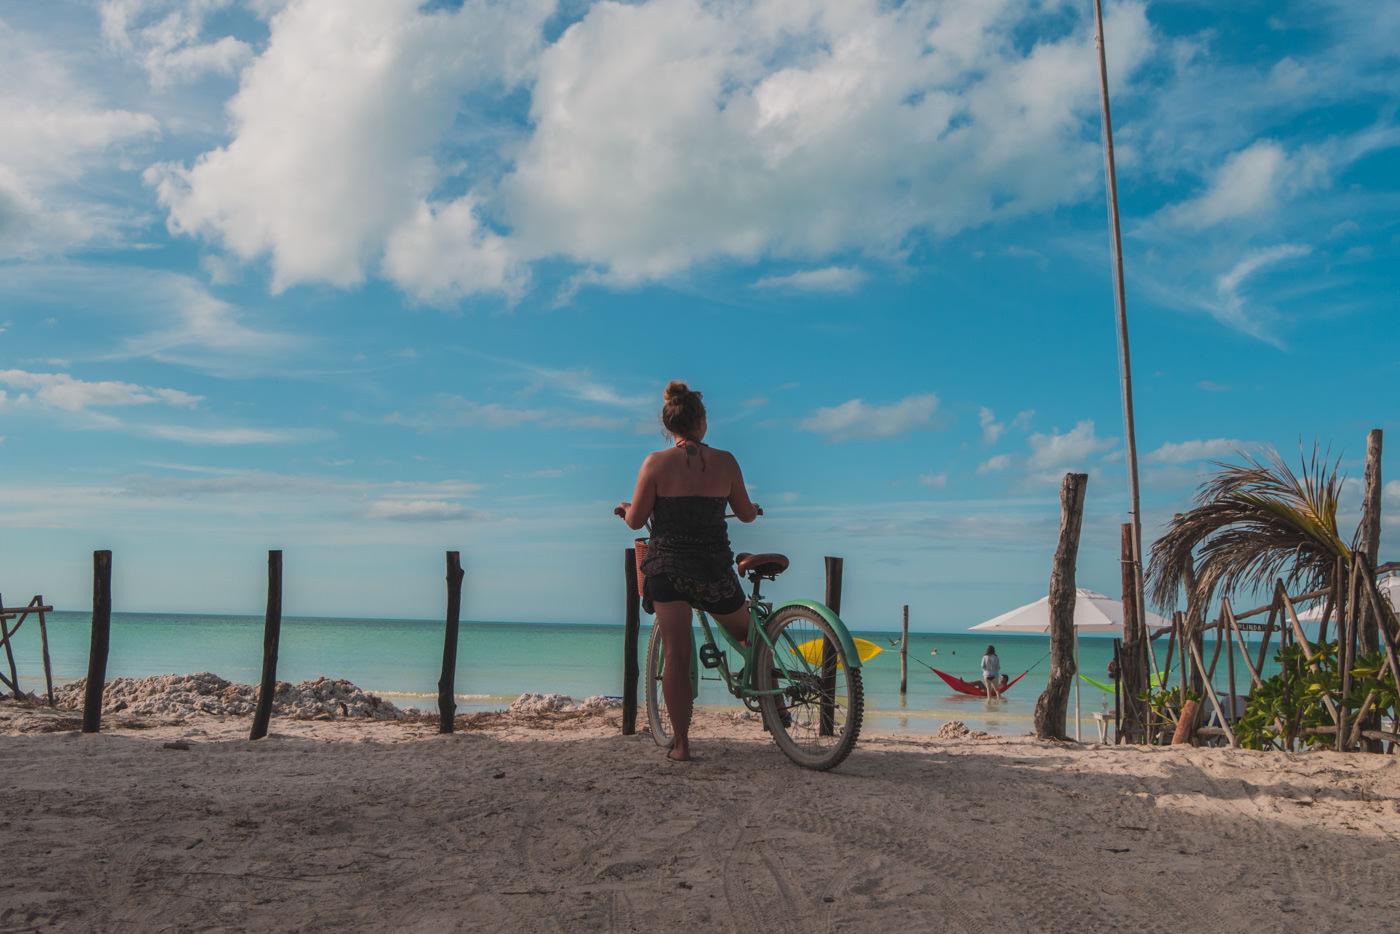 Julia auf dem Rad auf Isla Holbox in Mexiko